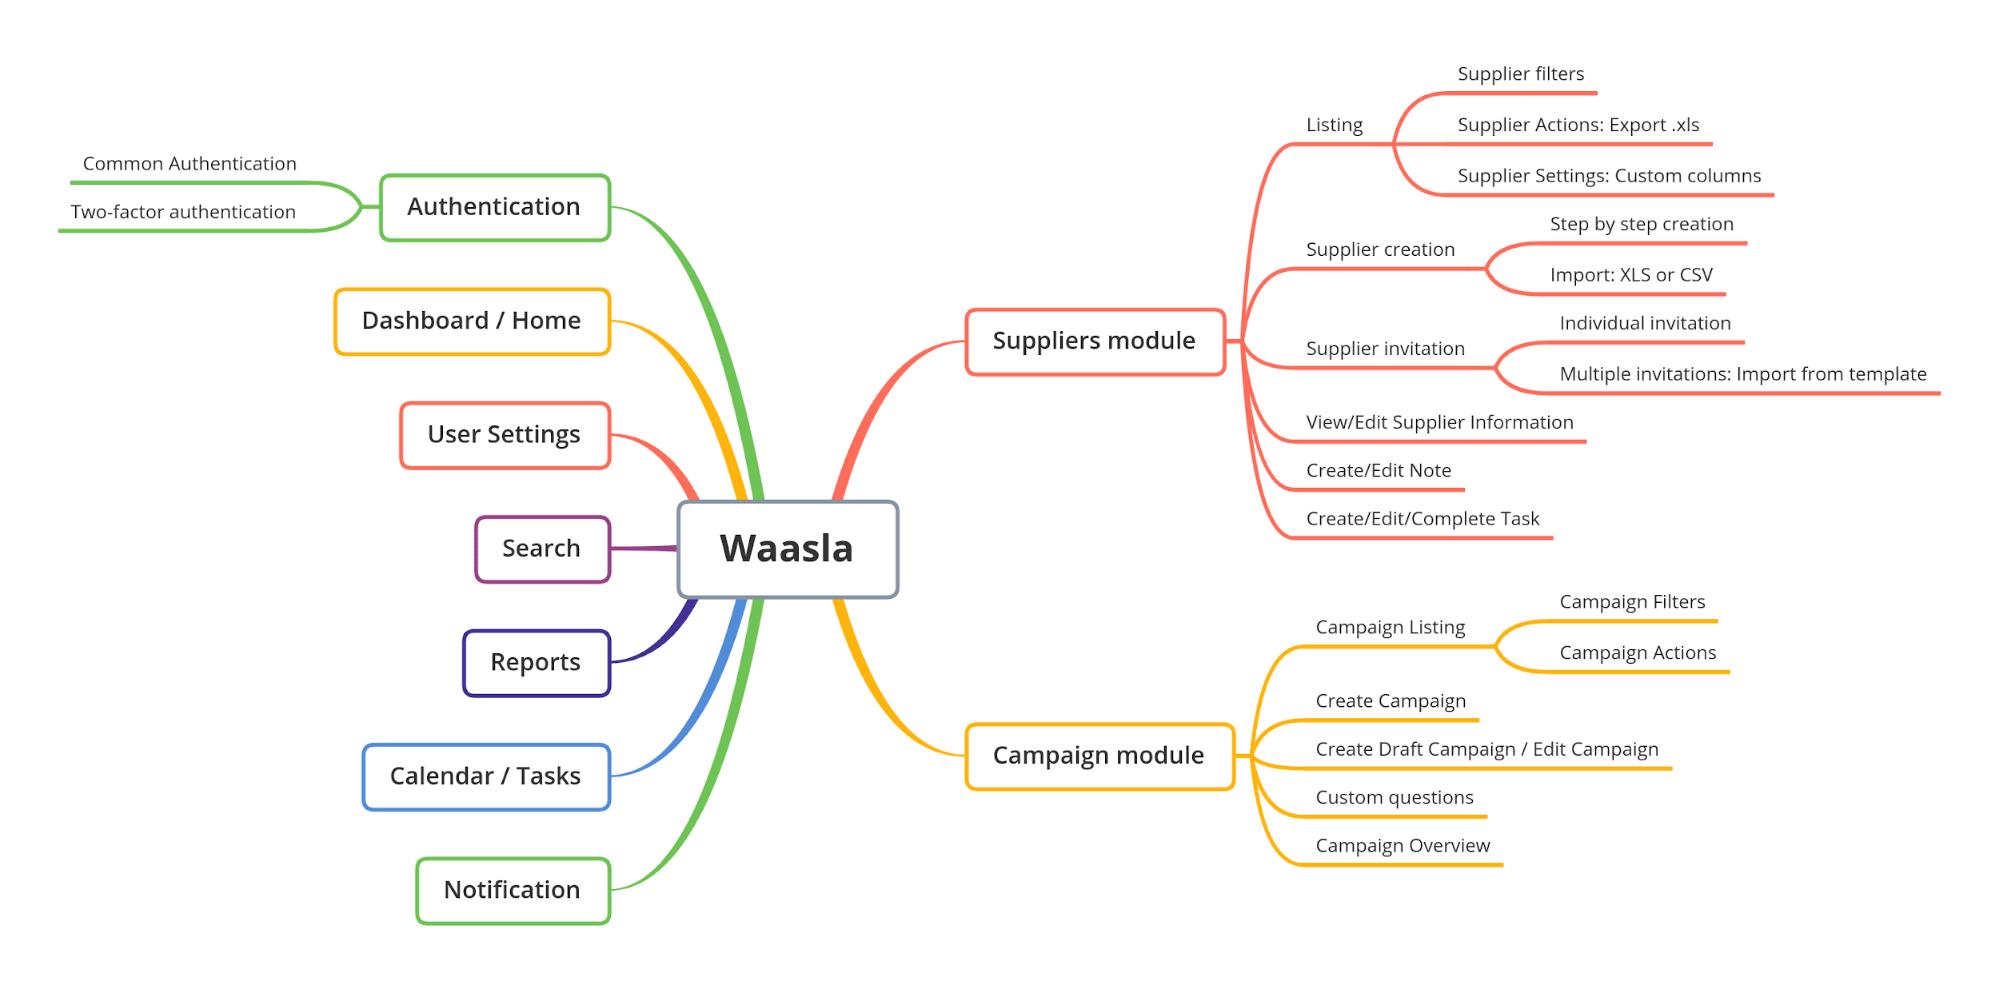 Functions of the Waasla SRM